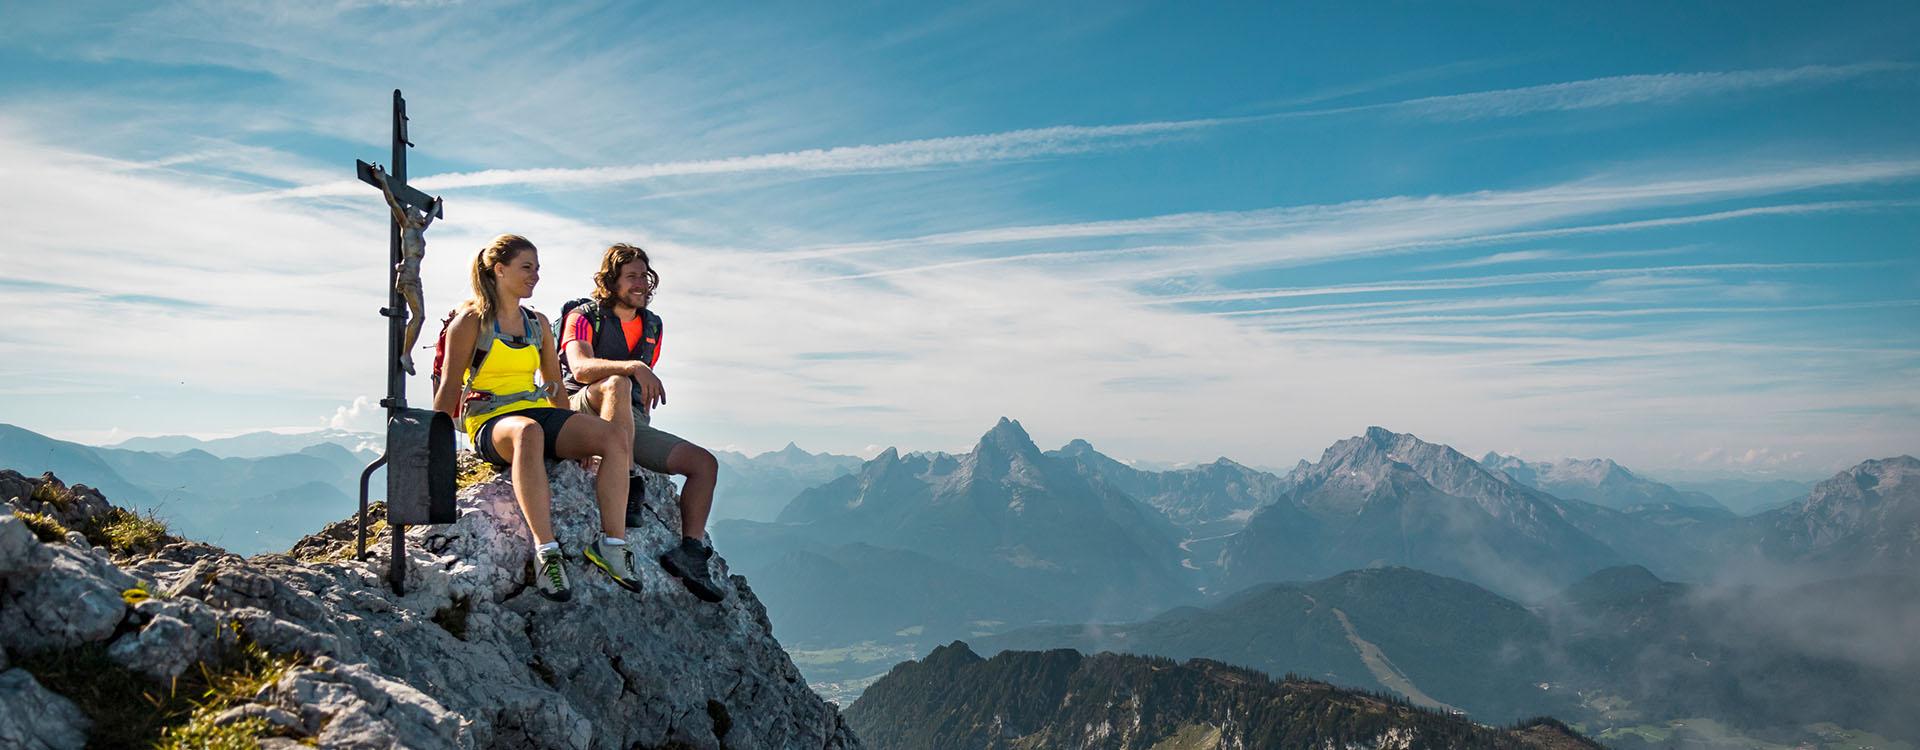 wandern-am-untersberg-in-berchtesgaden.jpg